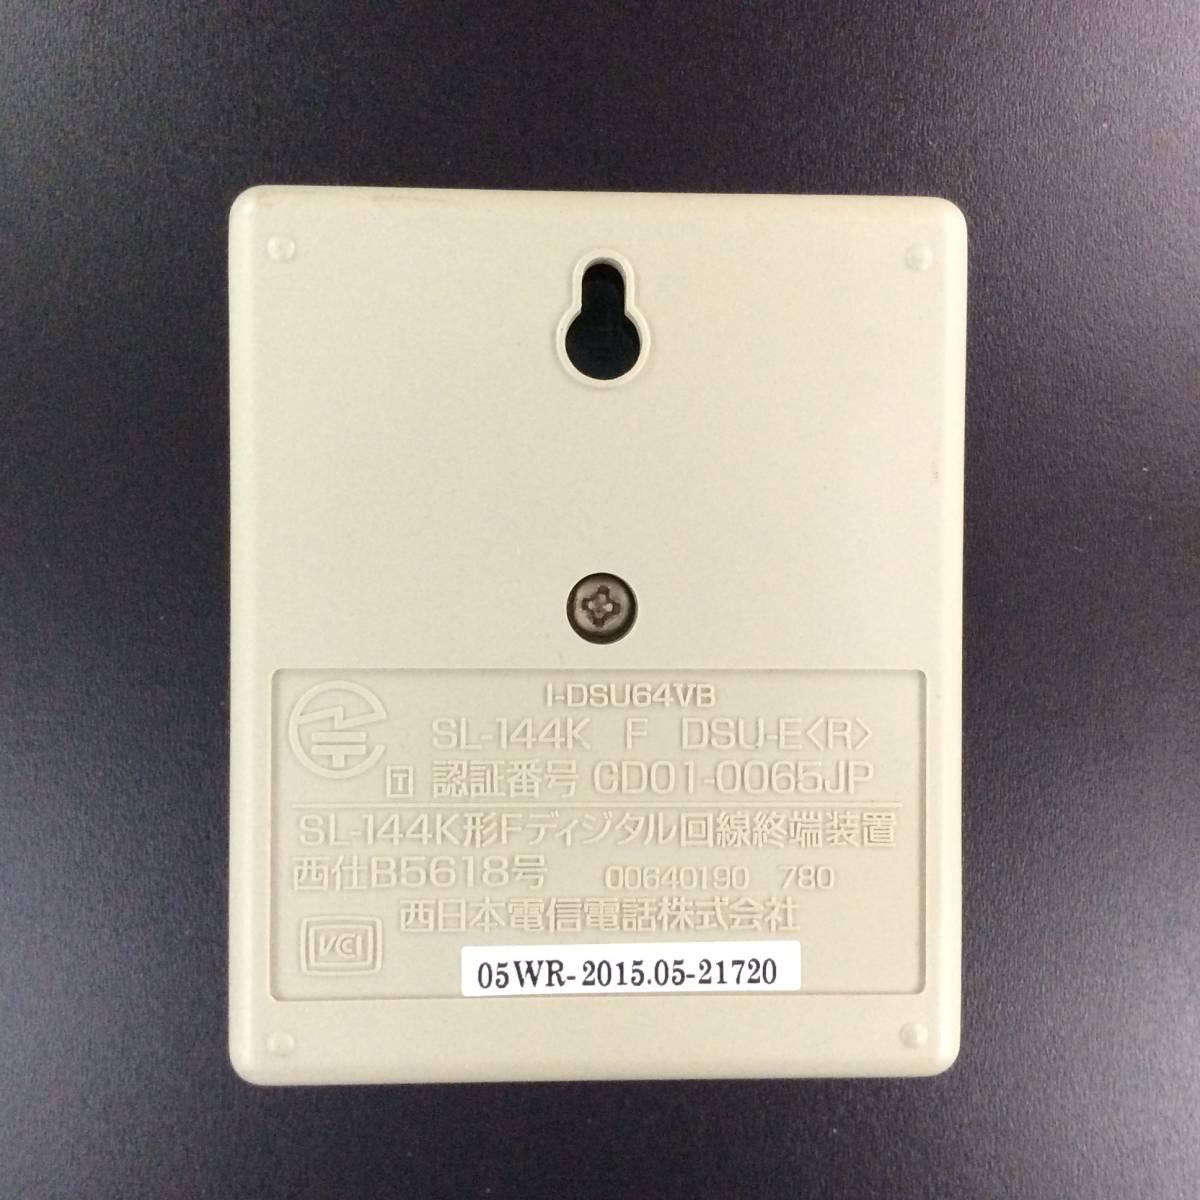 ★☆★ NTT 西日本 SL-144K F DSU-E〈R〉★☆★ 一度使用 美品 ★☆★ISDN DSU I-DSU64VB デジタル回線接続装置 _画像3